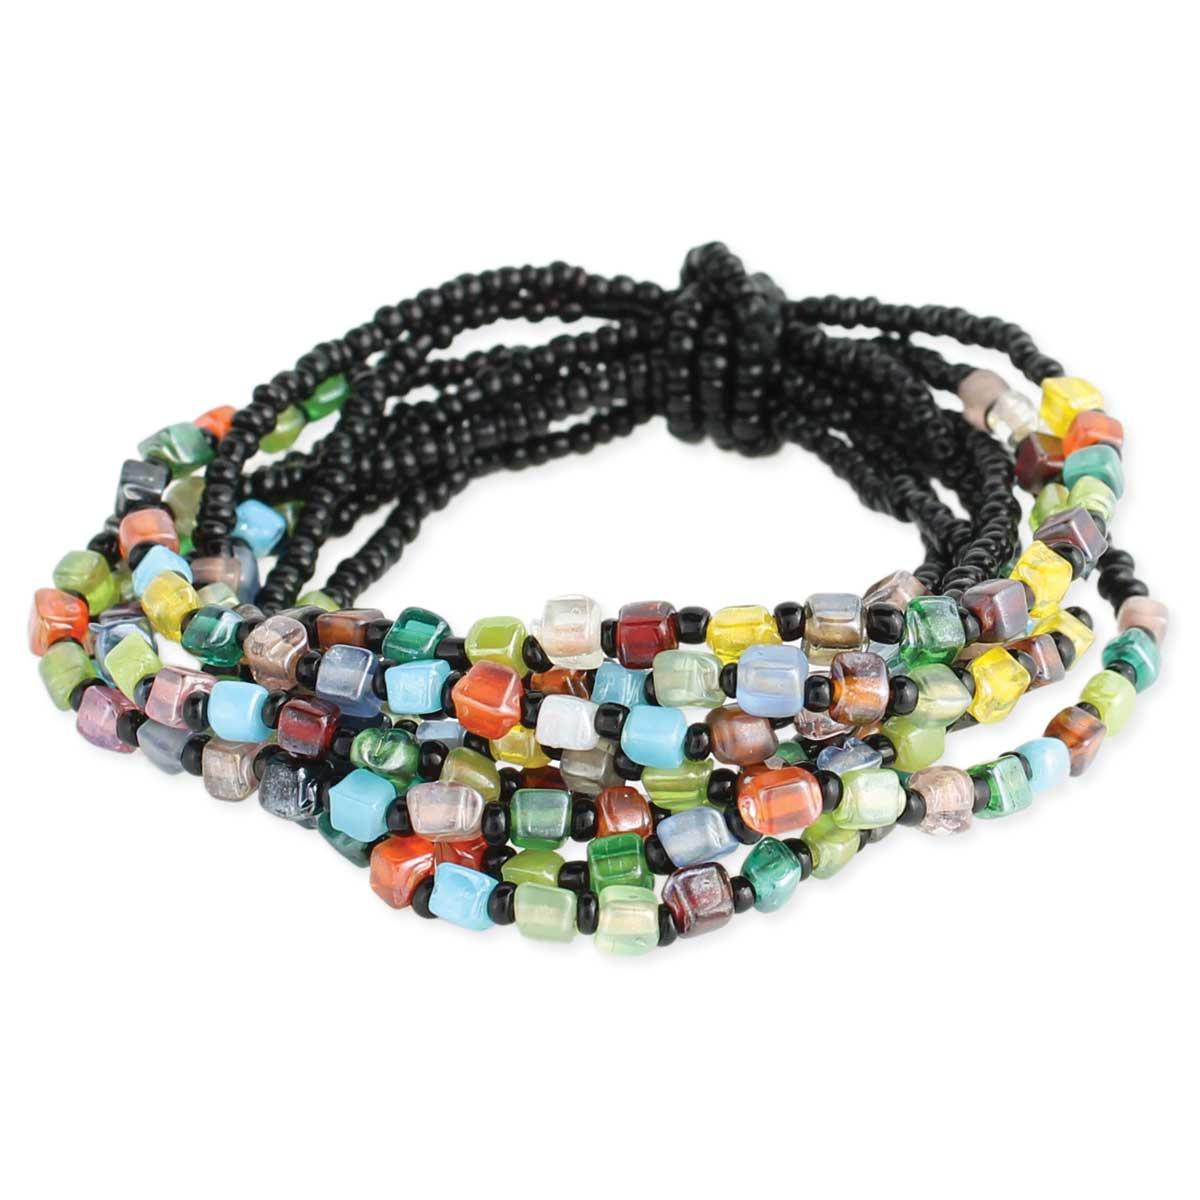 Mosaic Bead Stretch Bracelet Set